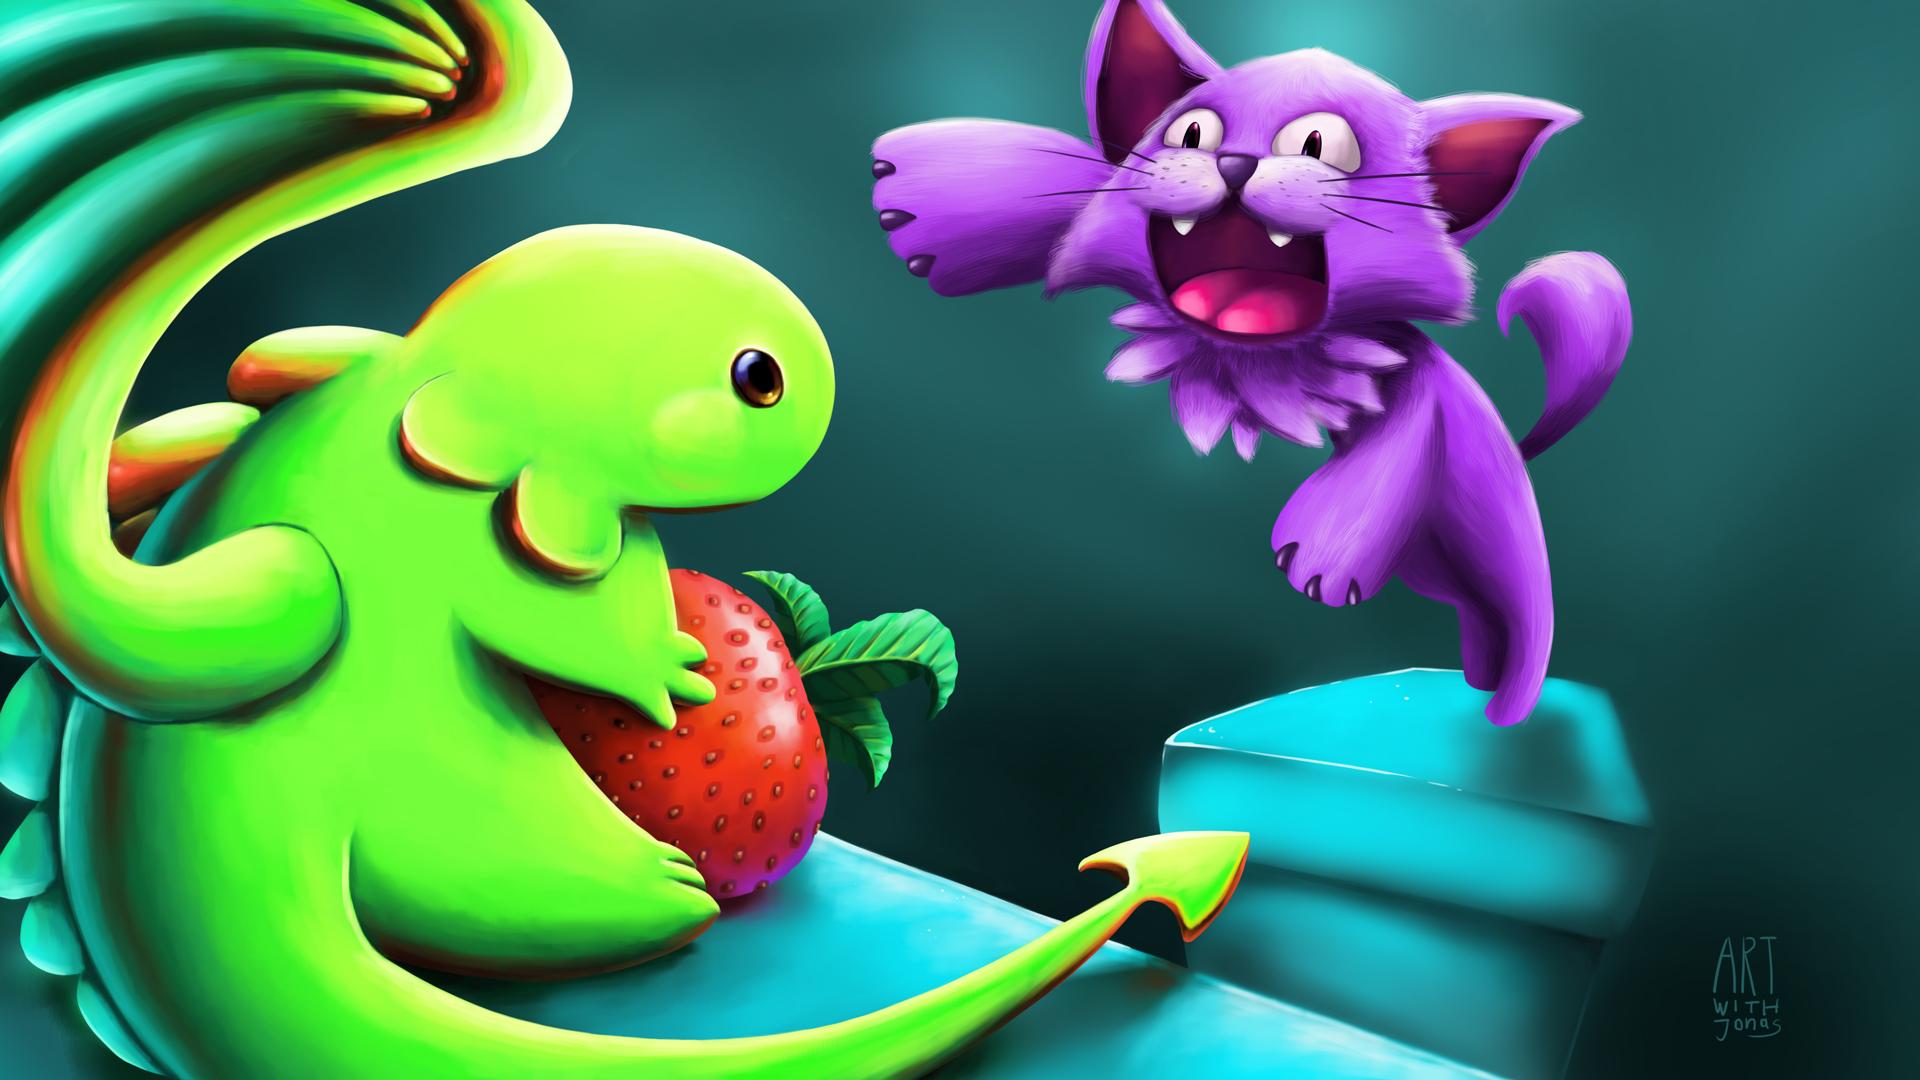 Fruit Thief